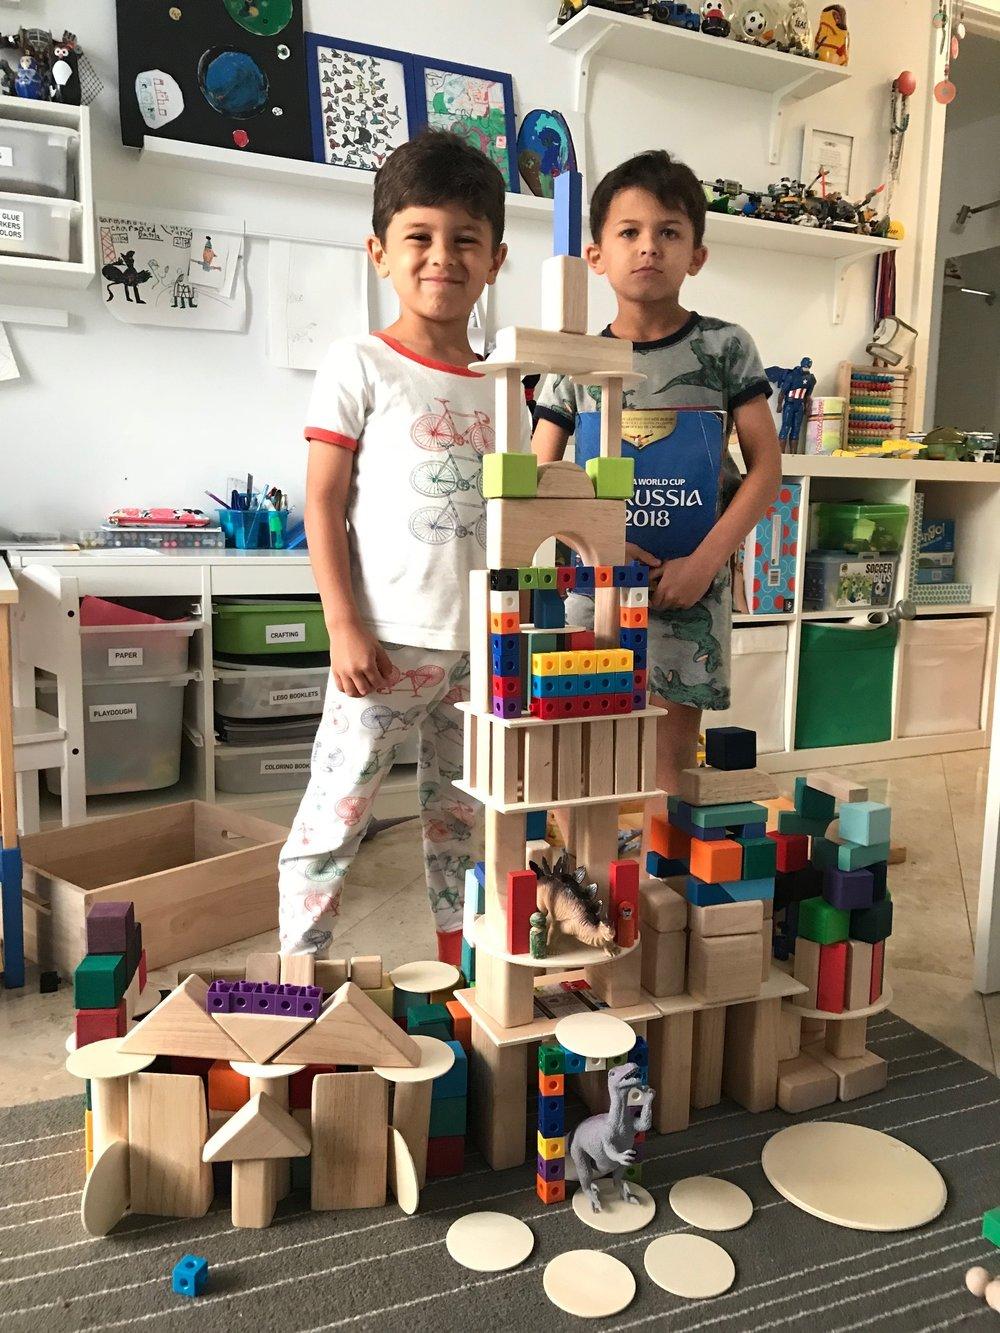 My boys, Manolo (5 yo)and Martin (7 yo)building castles.